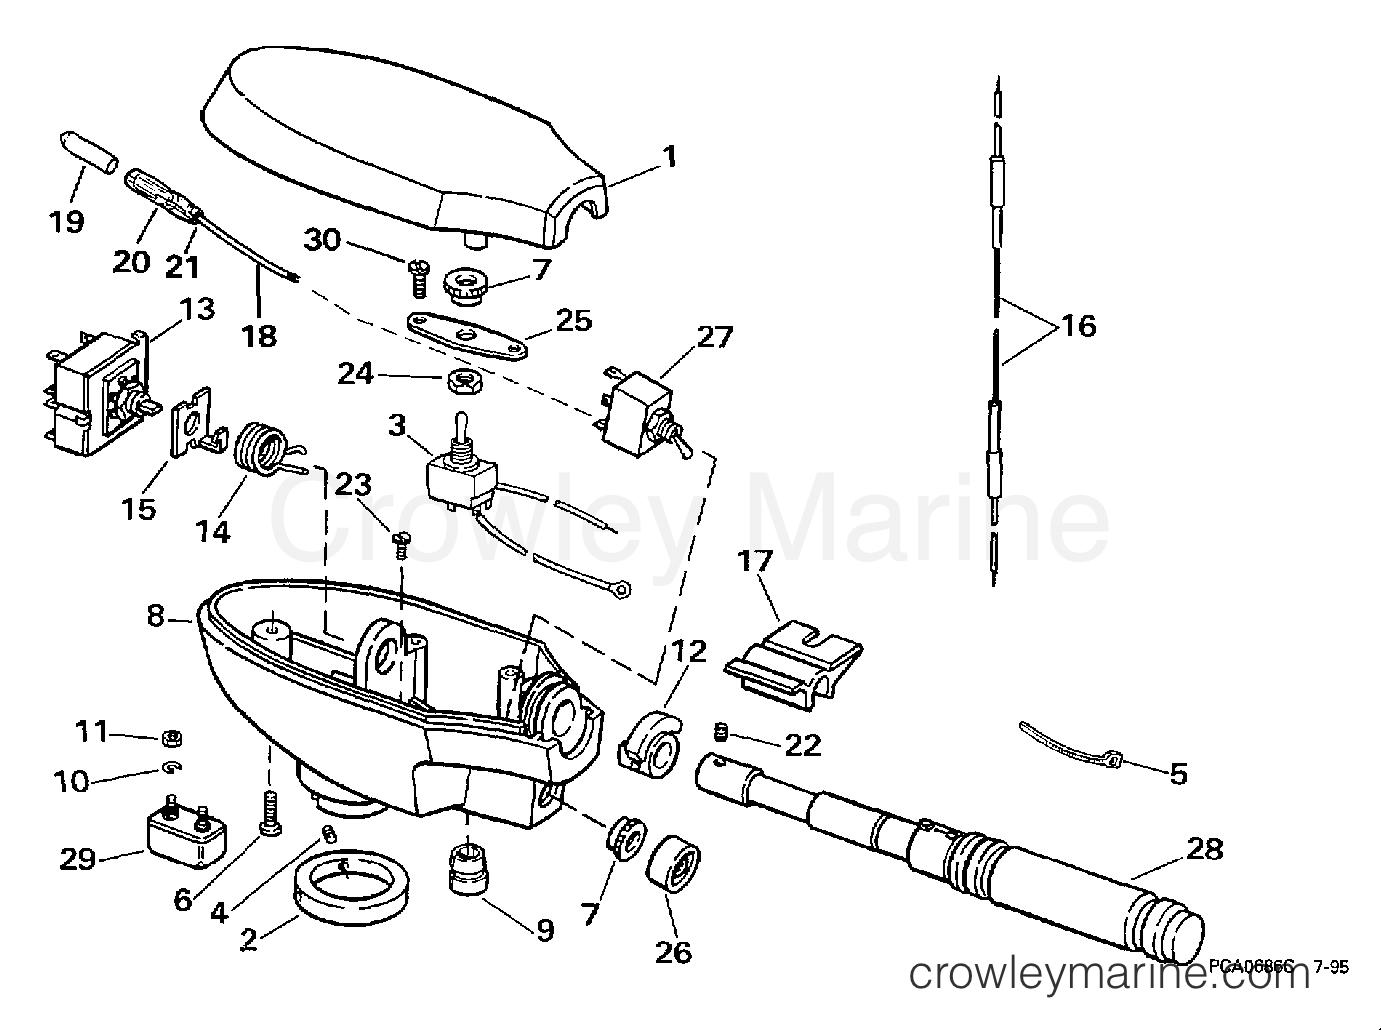 1997 Electric Motors 24 Volt - BFX4TPV - CONTROL HOUSING GROUP/HAND STEERING MODEL